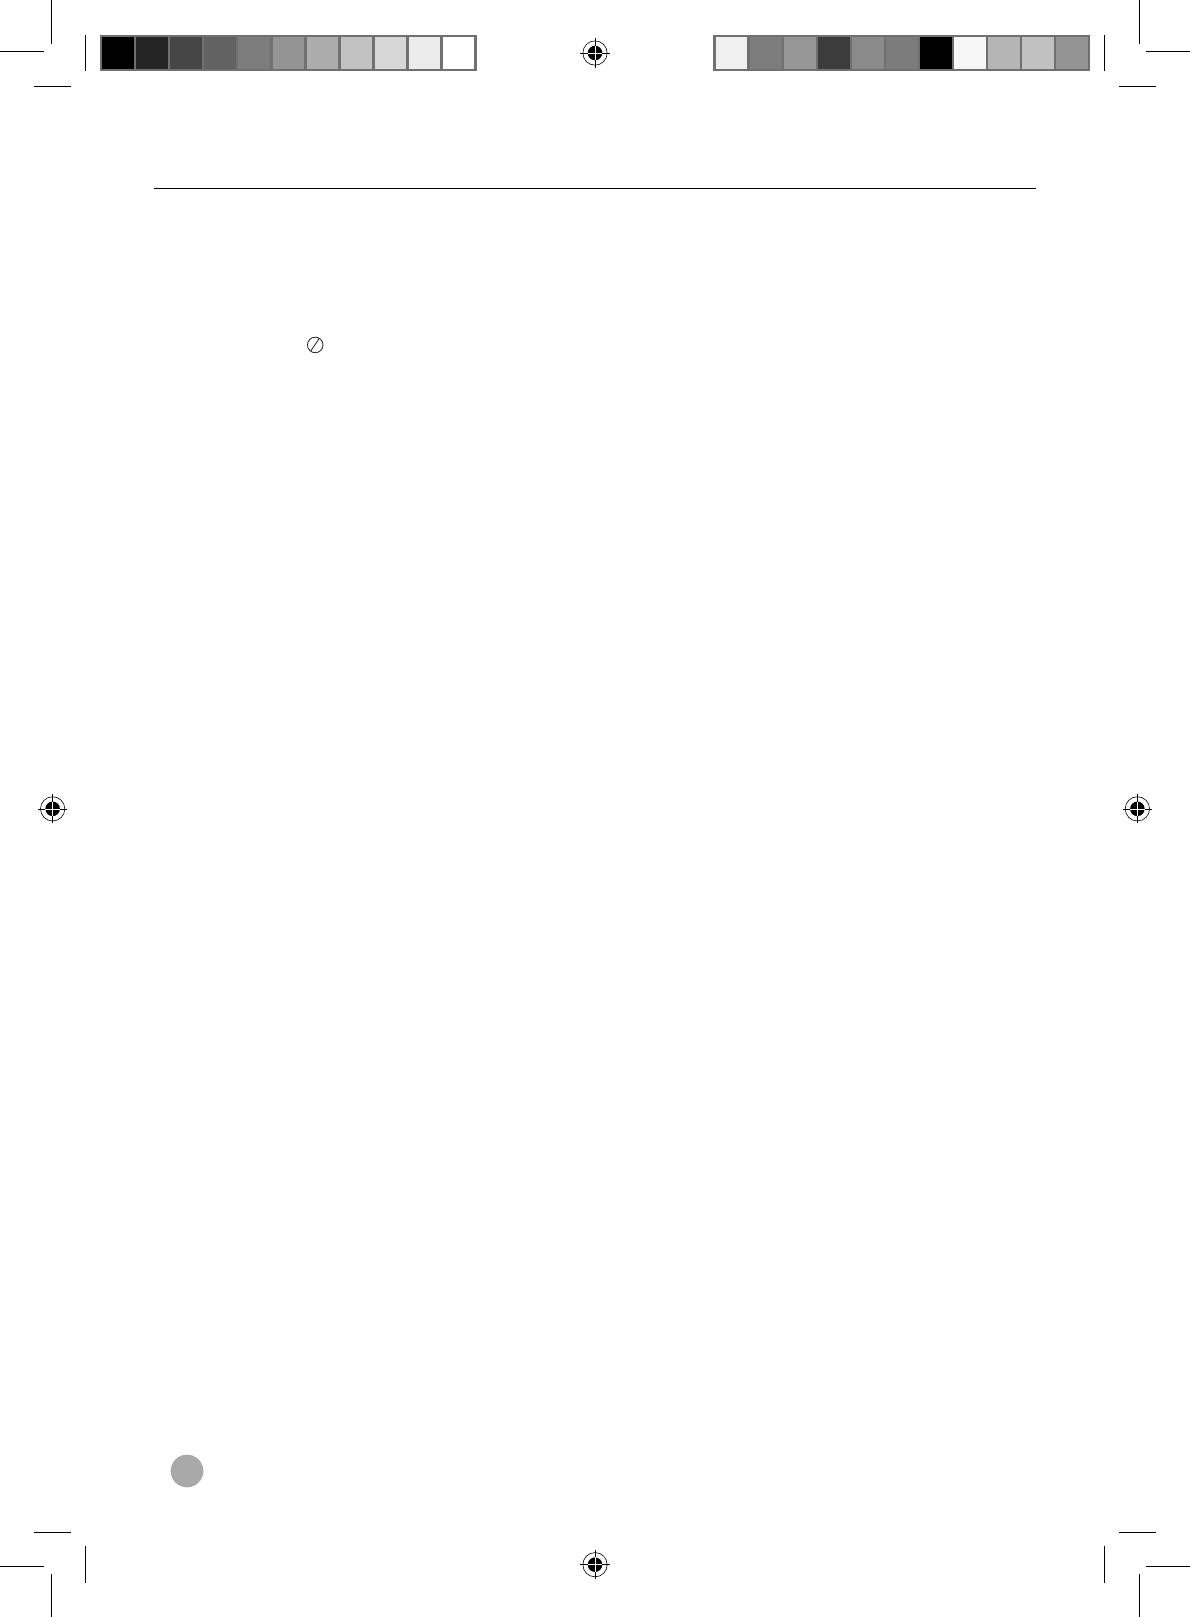 Lg hb965txw home theater system service manual ebook manual de instru es pdf 711kb jvc array mfl65220802 hb965 hb905 hb905sbw hb965txw rh usermanual wiki fandeluxe Image collections